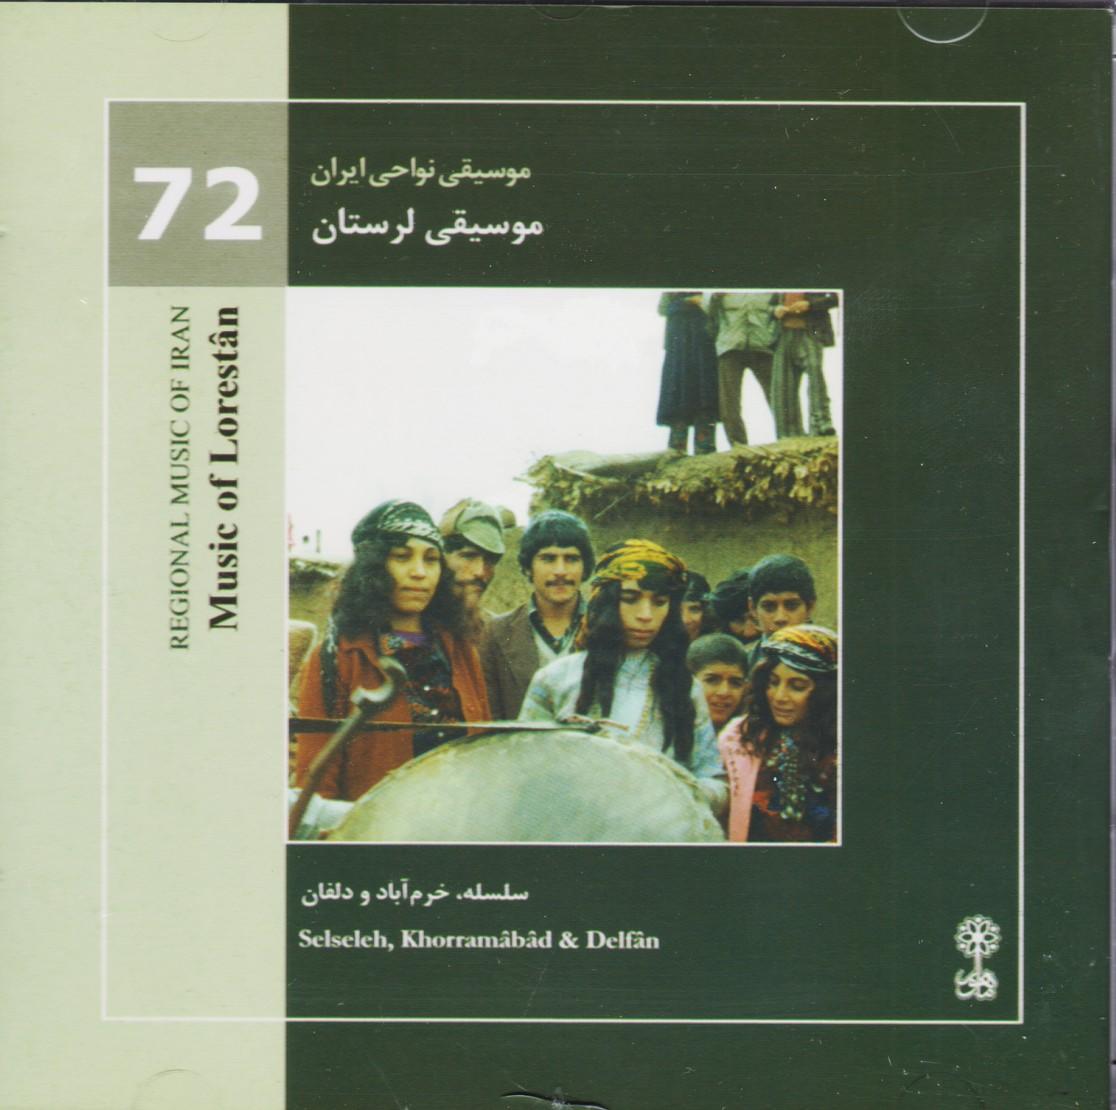 موسیقی لرستان/سلسله.خرم آباد.دلفان: موسیقی نواحی ایران 72